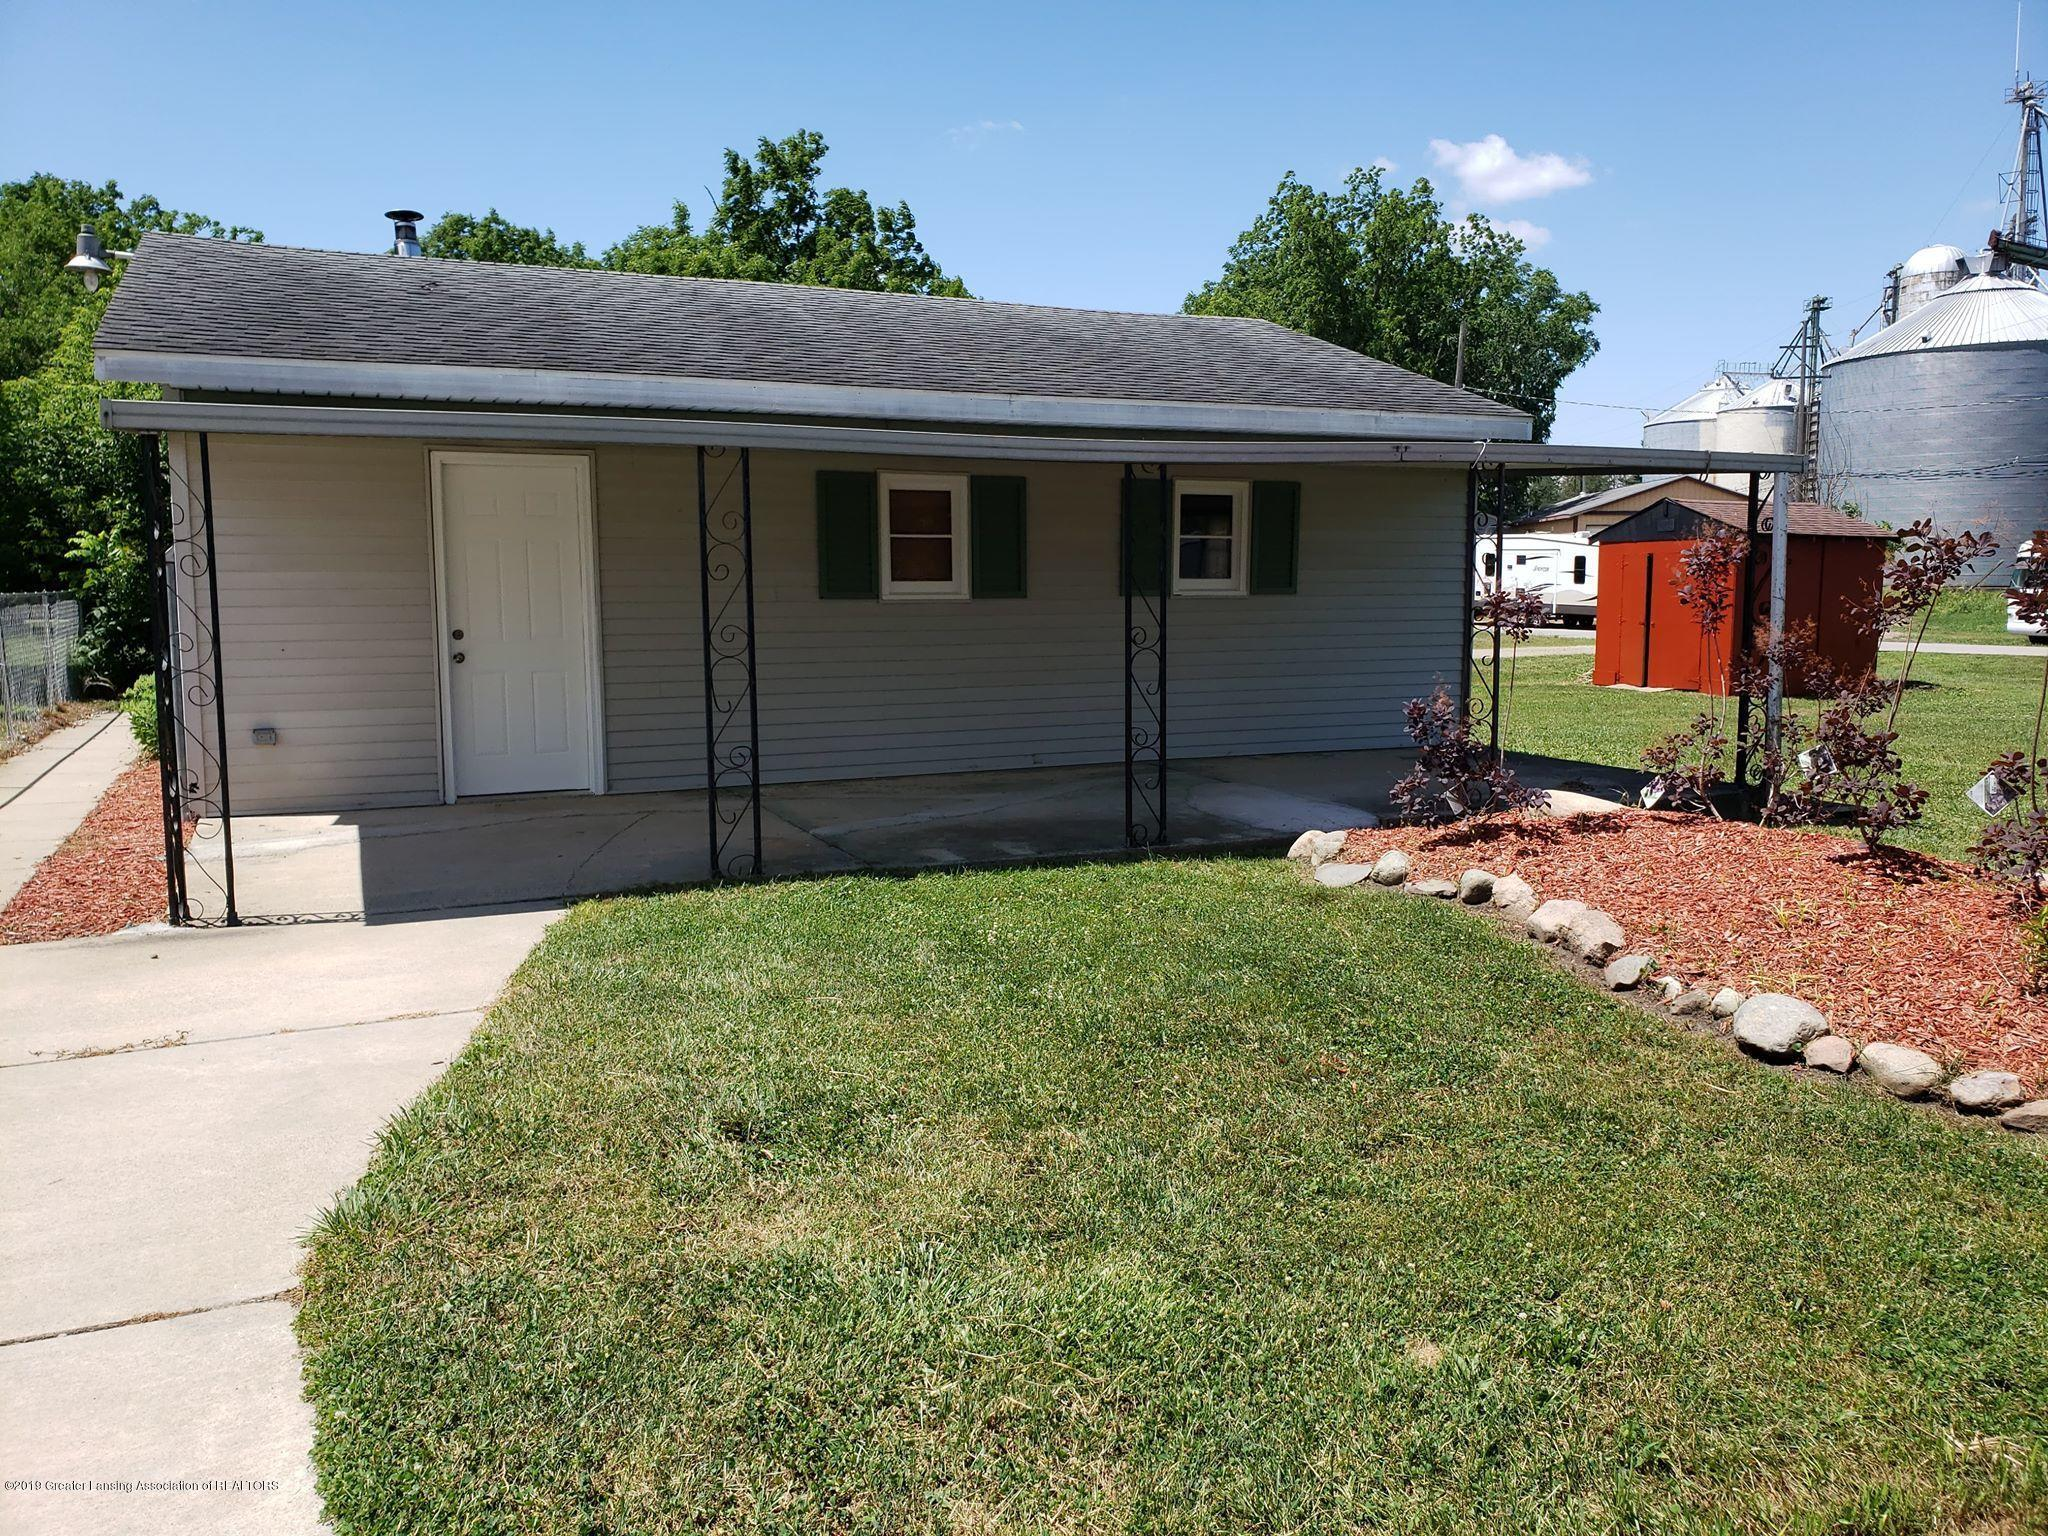 906 Hall St - garage & patio area - 11